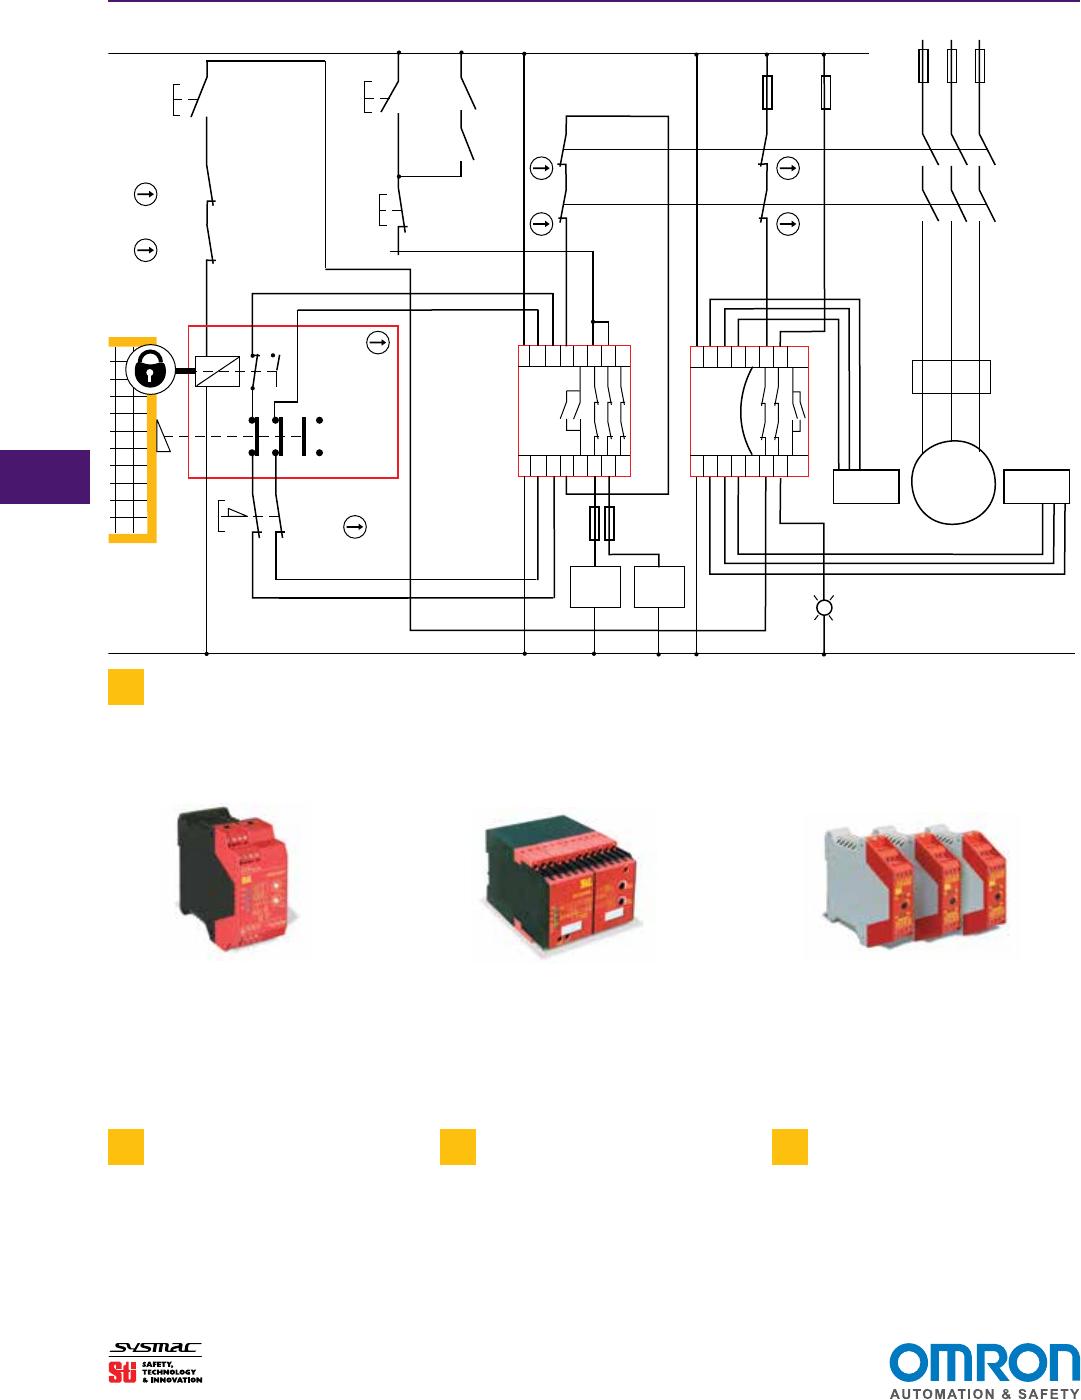 Diagram Sti Tl4024 Wiring Diagram Full Version Hd Quality Wiring Diagram Diagramhodol Unanimaleundono It